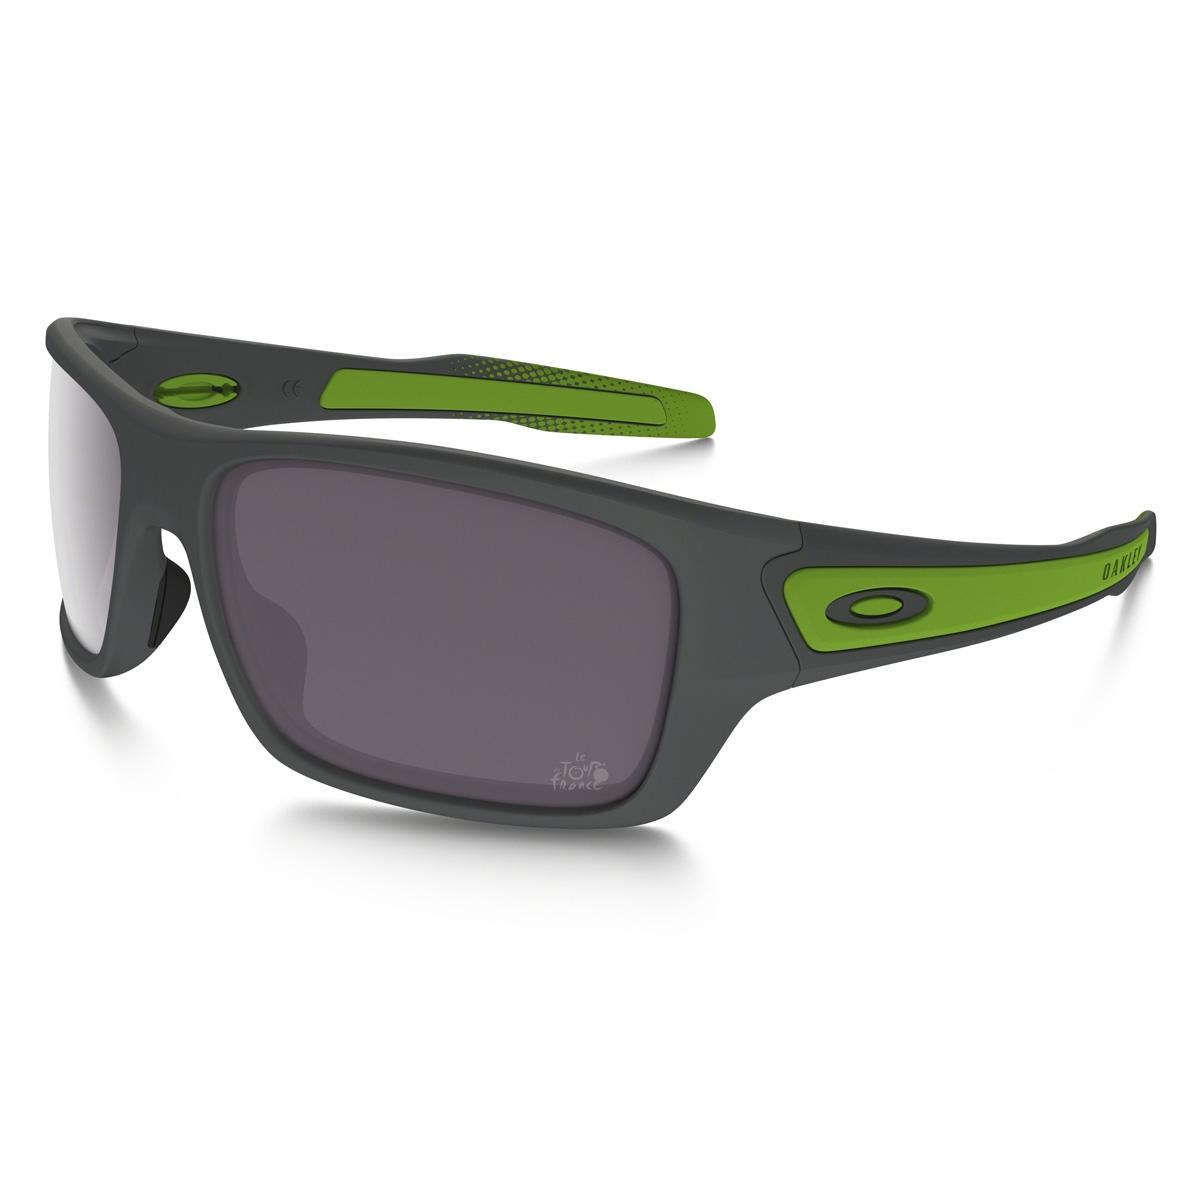 158a4ee97e Image of Oakley Turbine Prizm Daily Polarized Tour De France Sunglasses -  Matte Dark Grey Frame